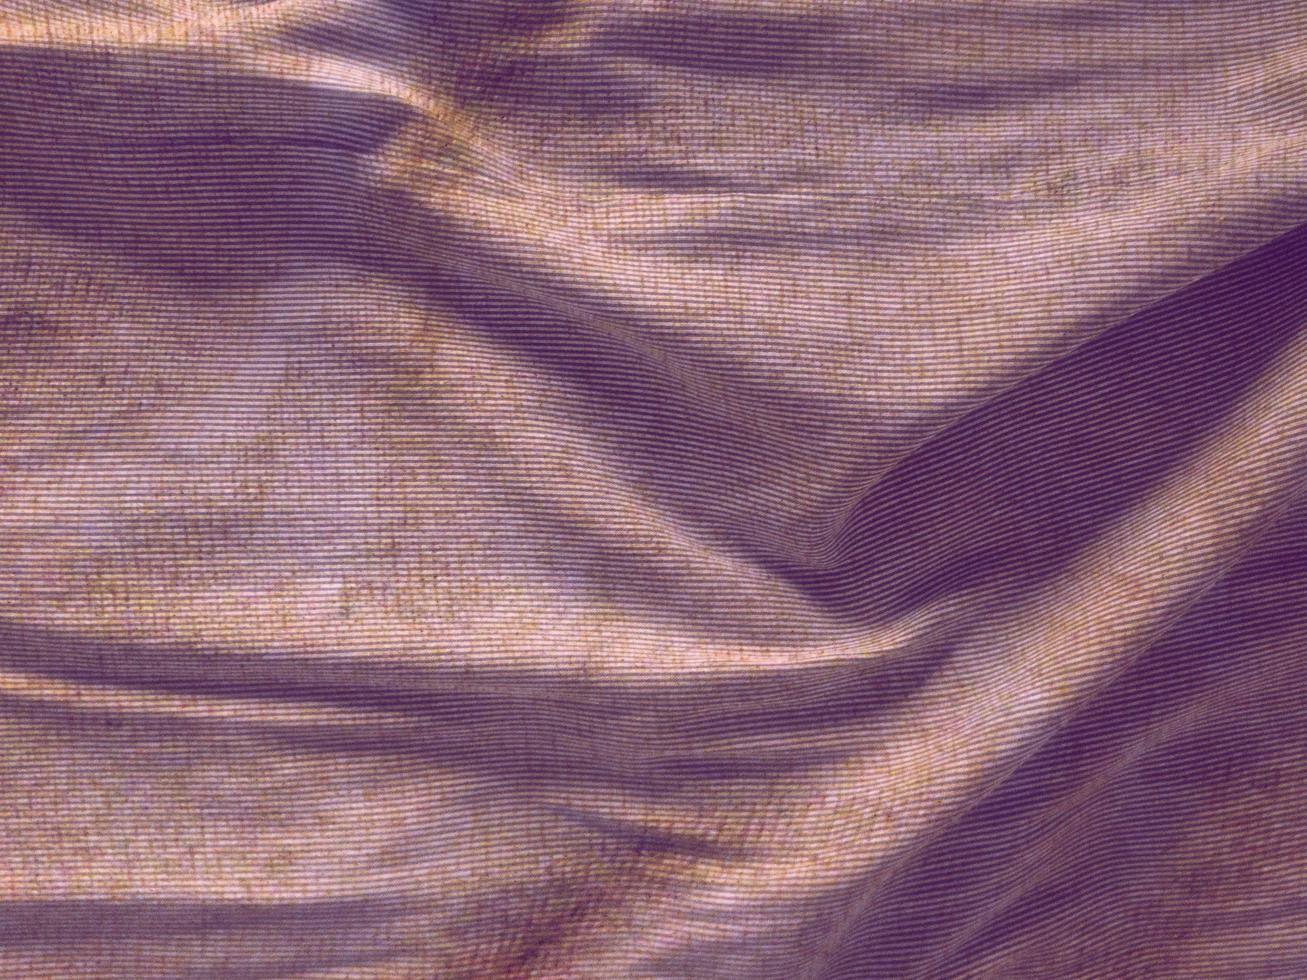 utomhusduk textur foto